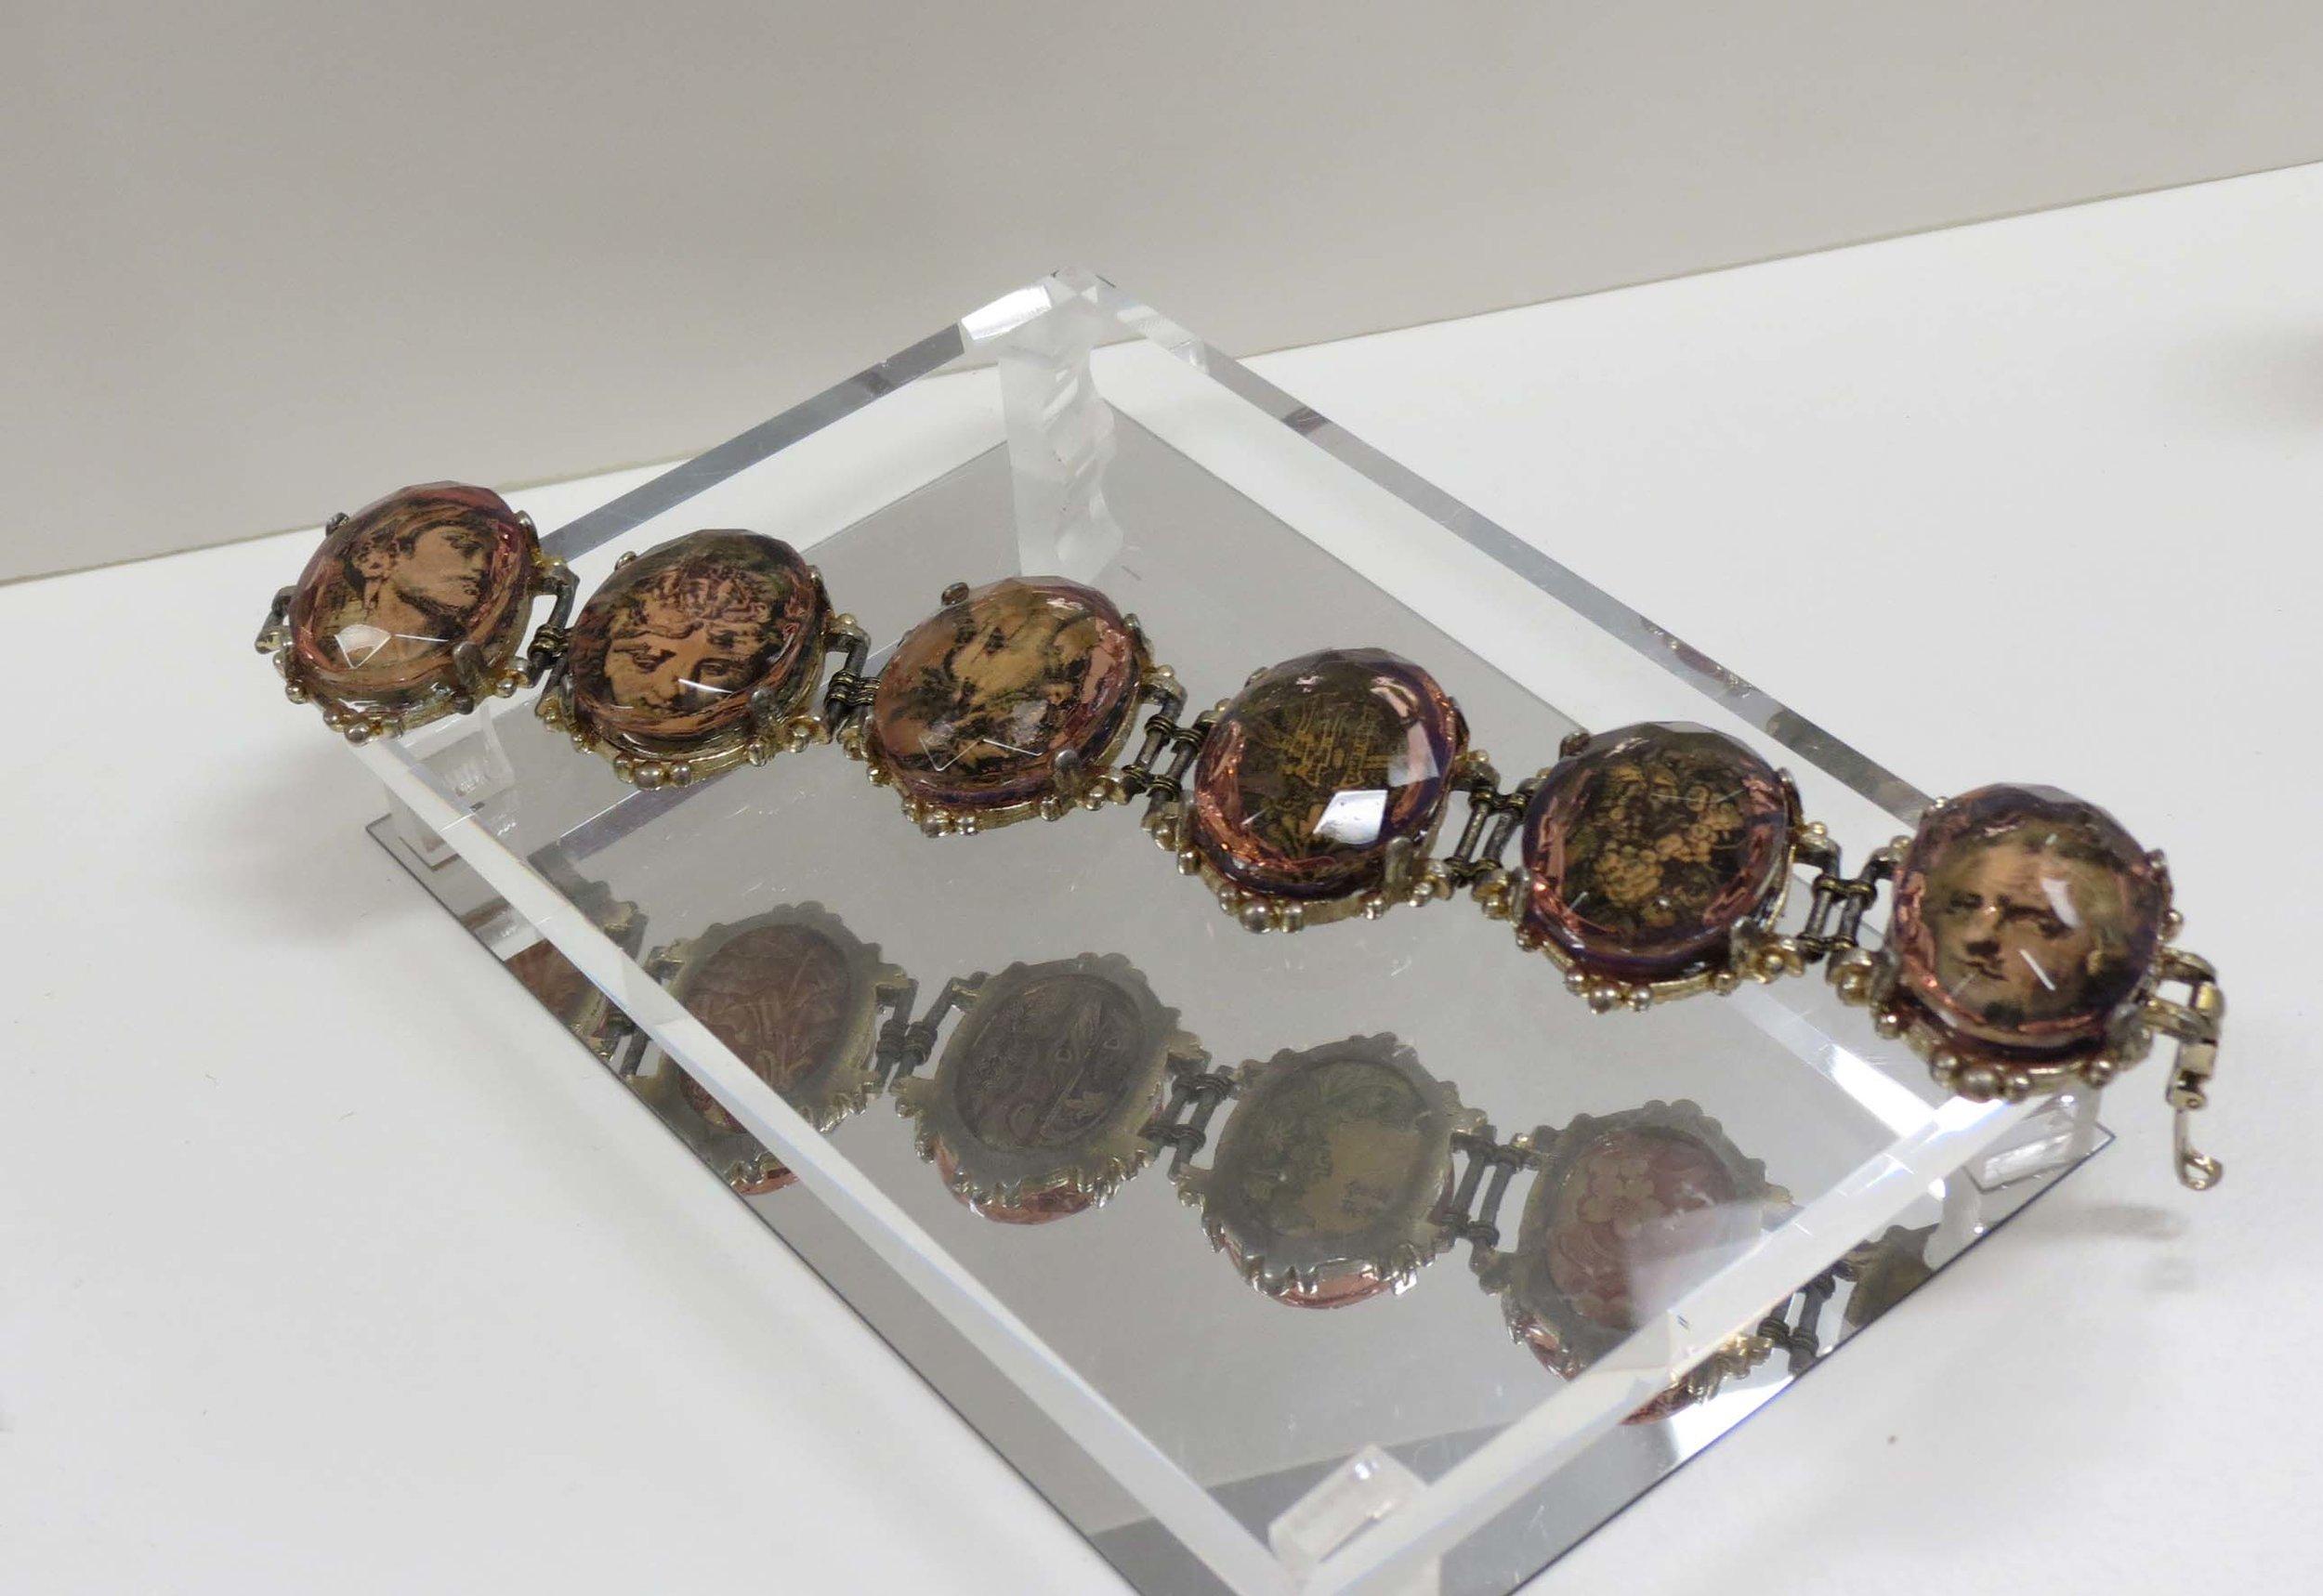 26. Kathy Aspinall, 'Russia', 2018, 1950's bracelet, Russian banknote, glass, resin, bracelet, $320